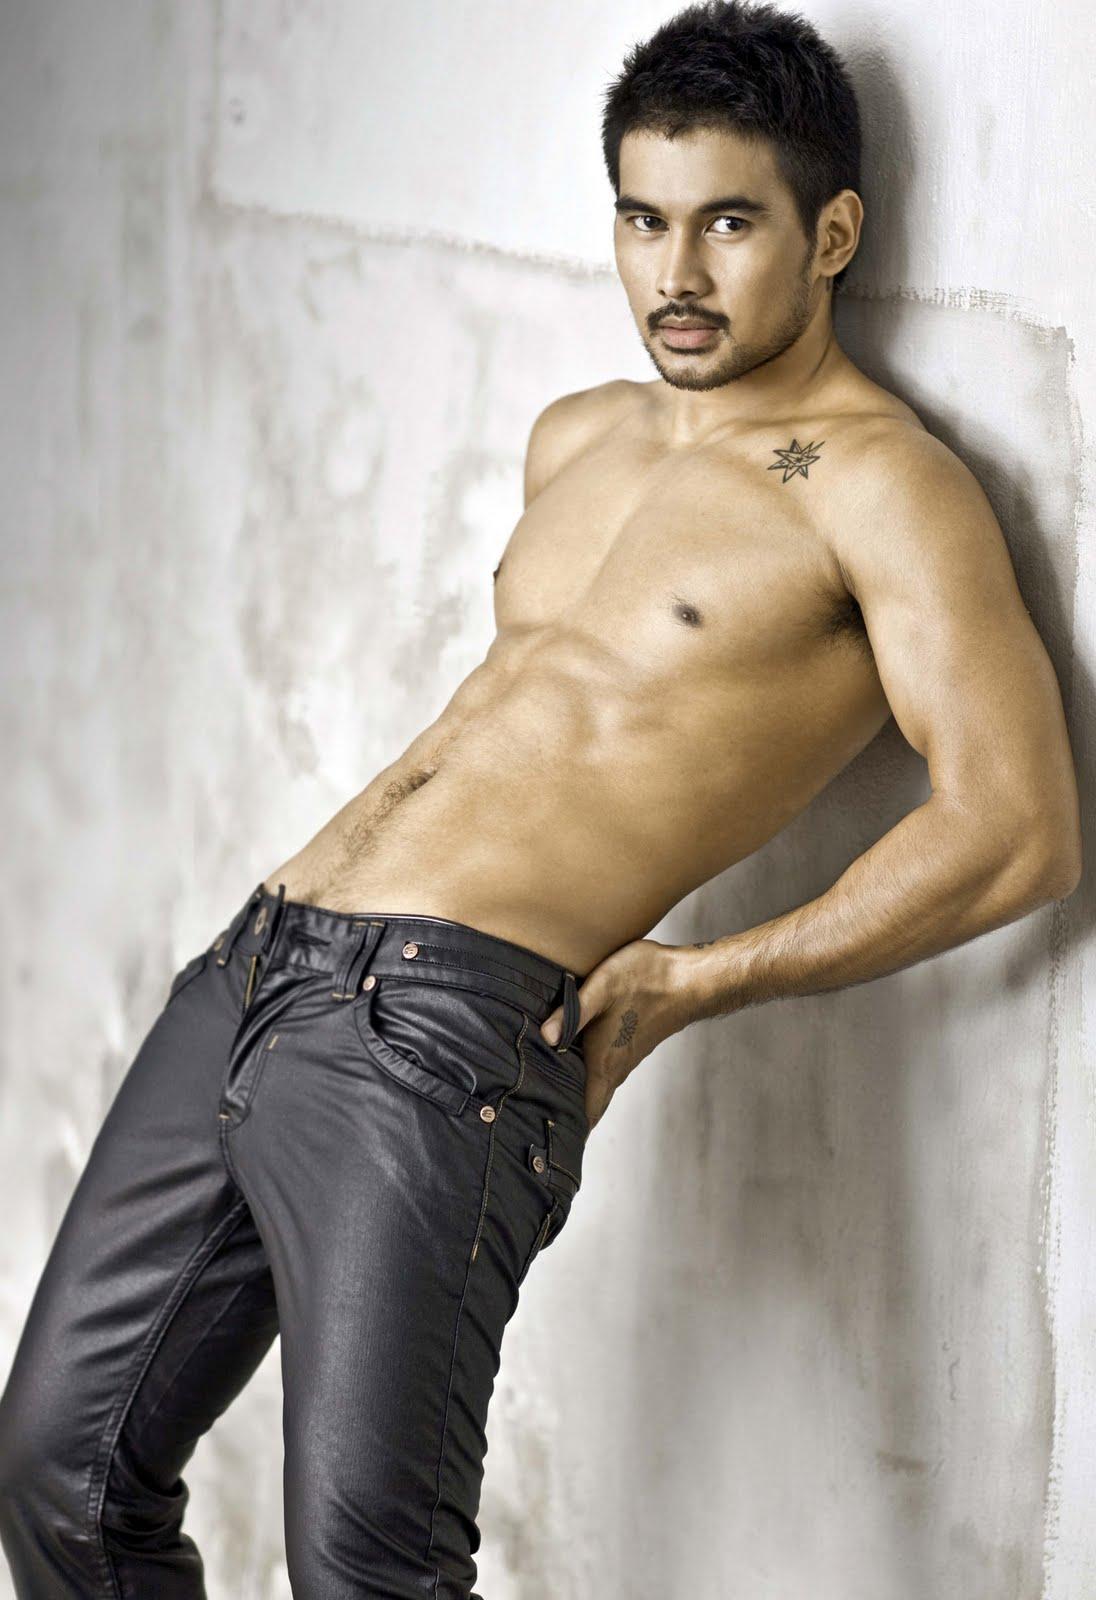 Nude Guy Skinny Jeans - Hot Girls Wallpaper